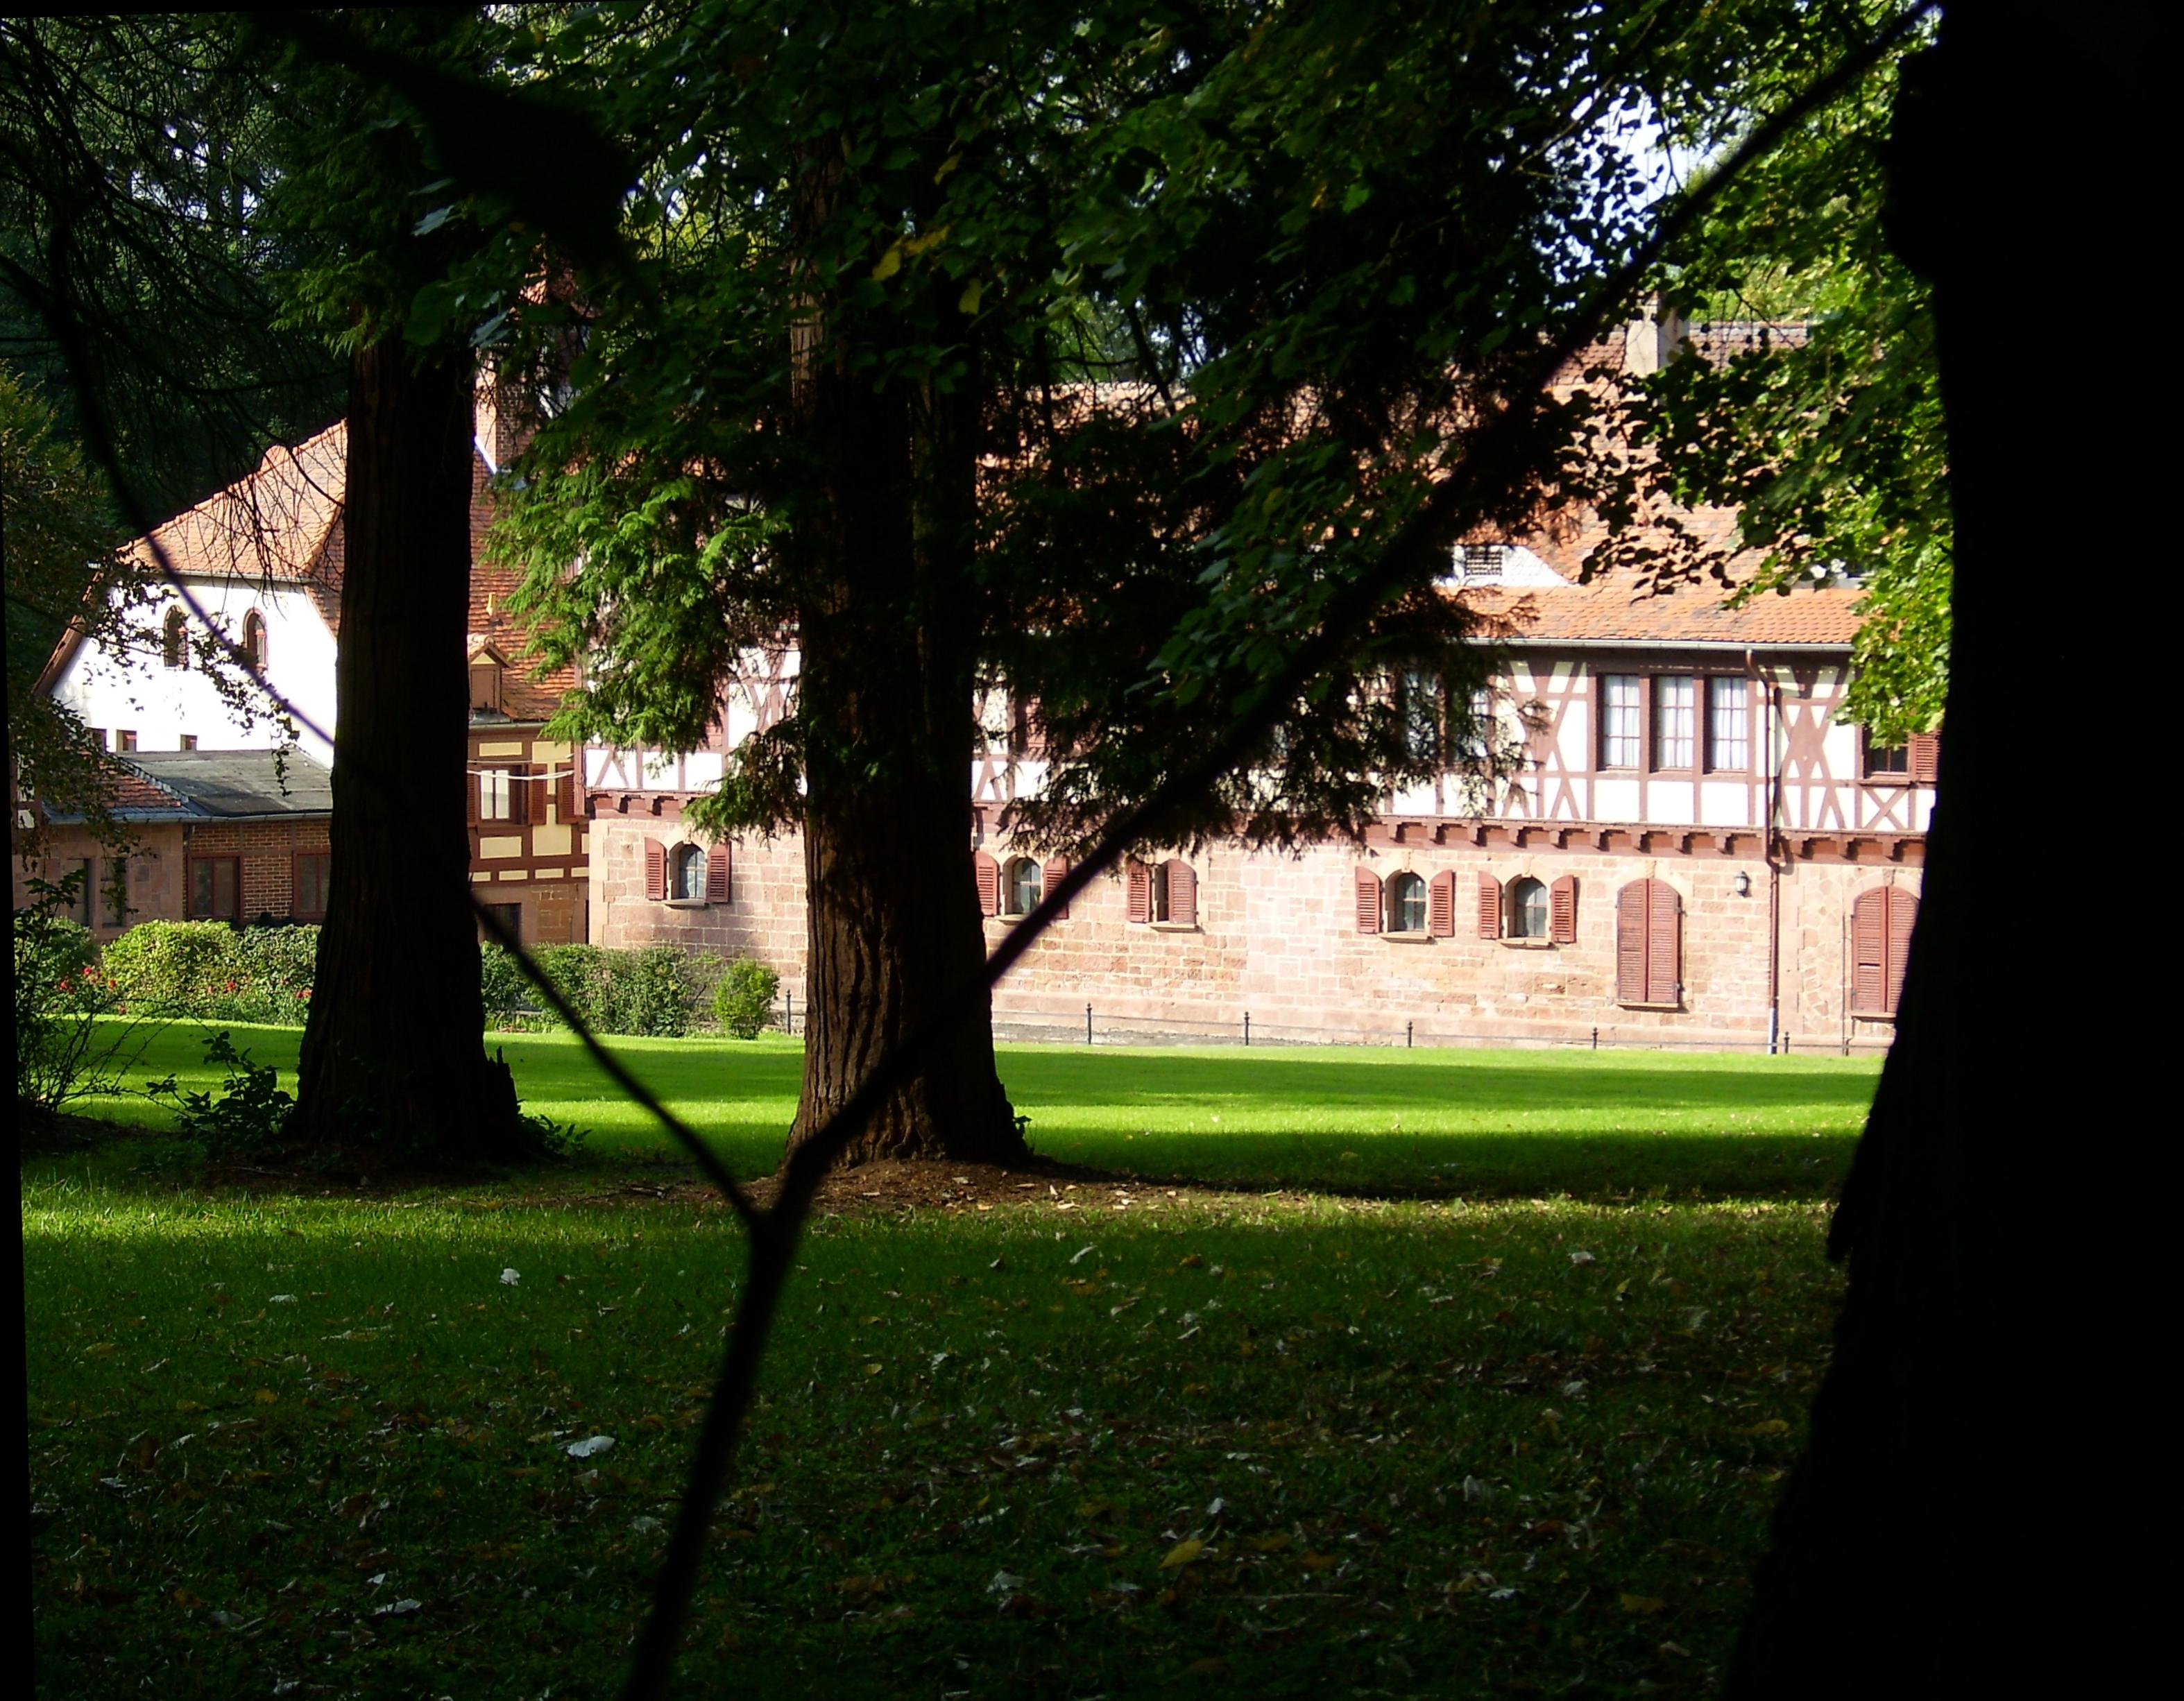 File:Schloss Plausdorf Wirtschaftsgebaeude.jpg - Wikimedia Commons